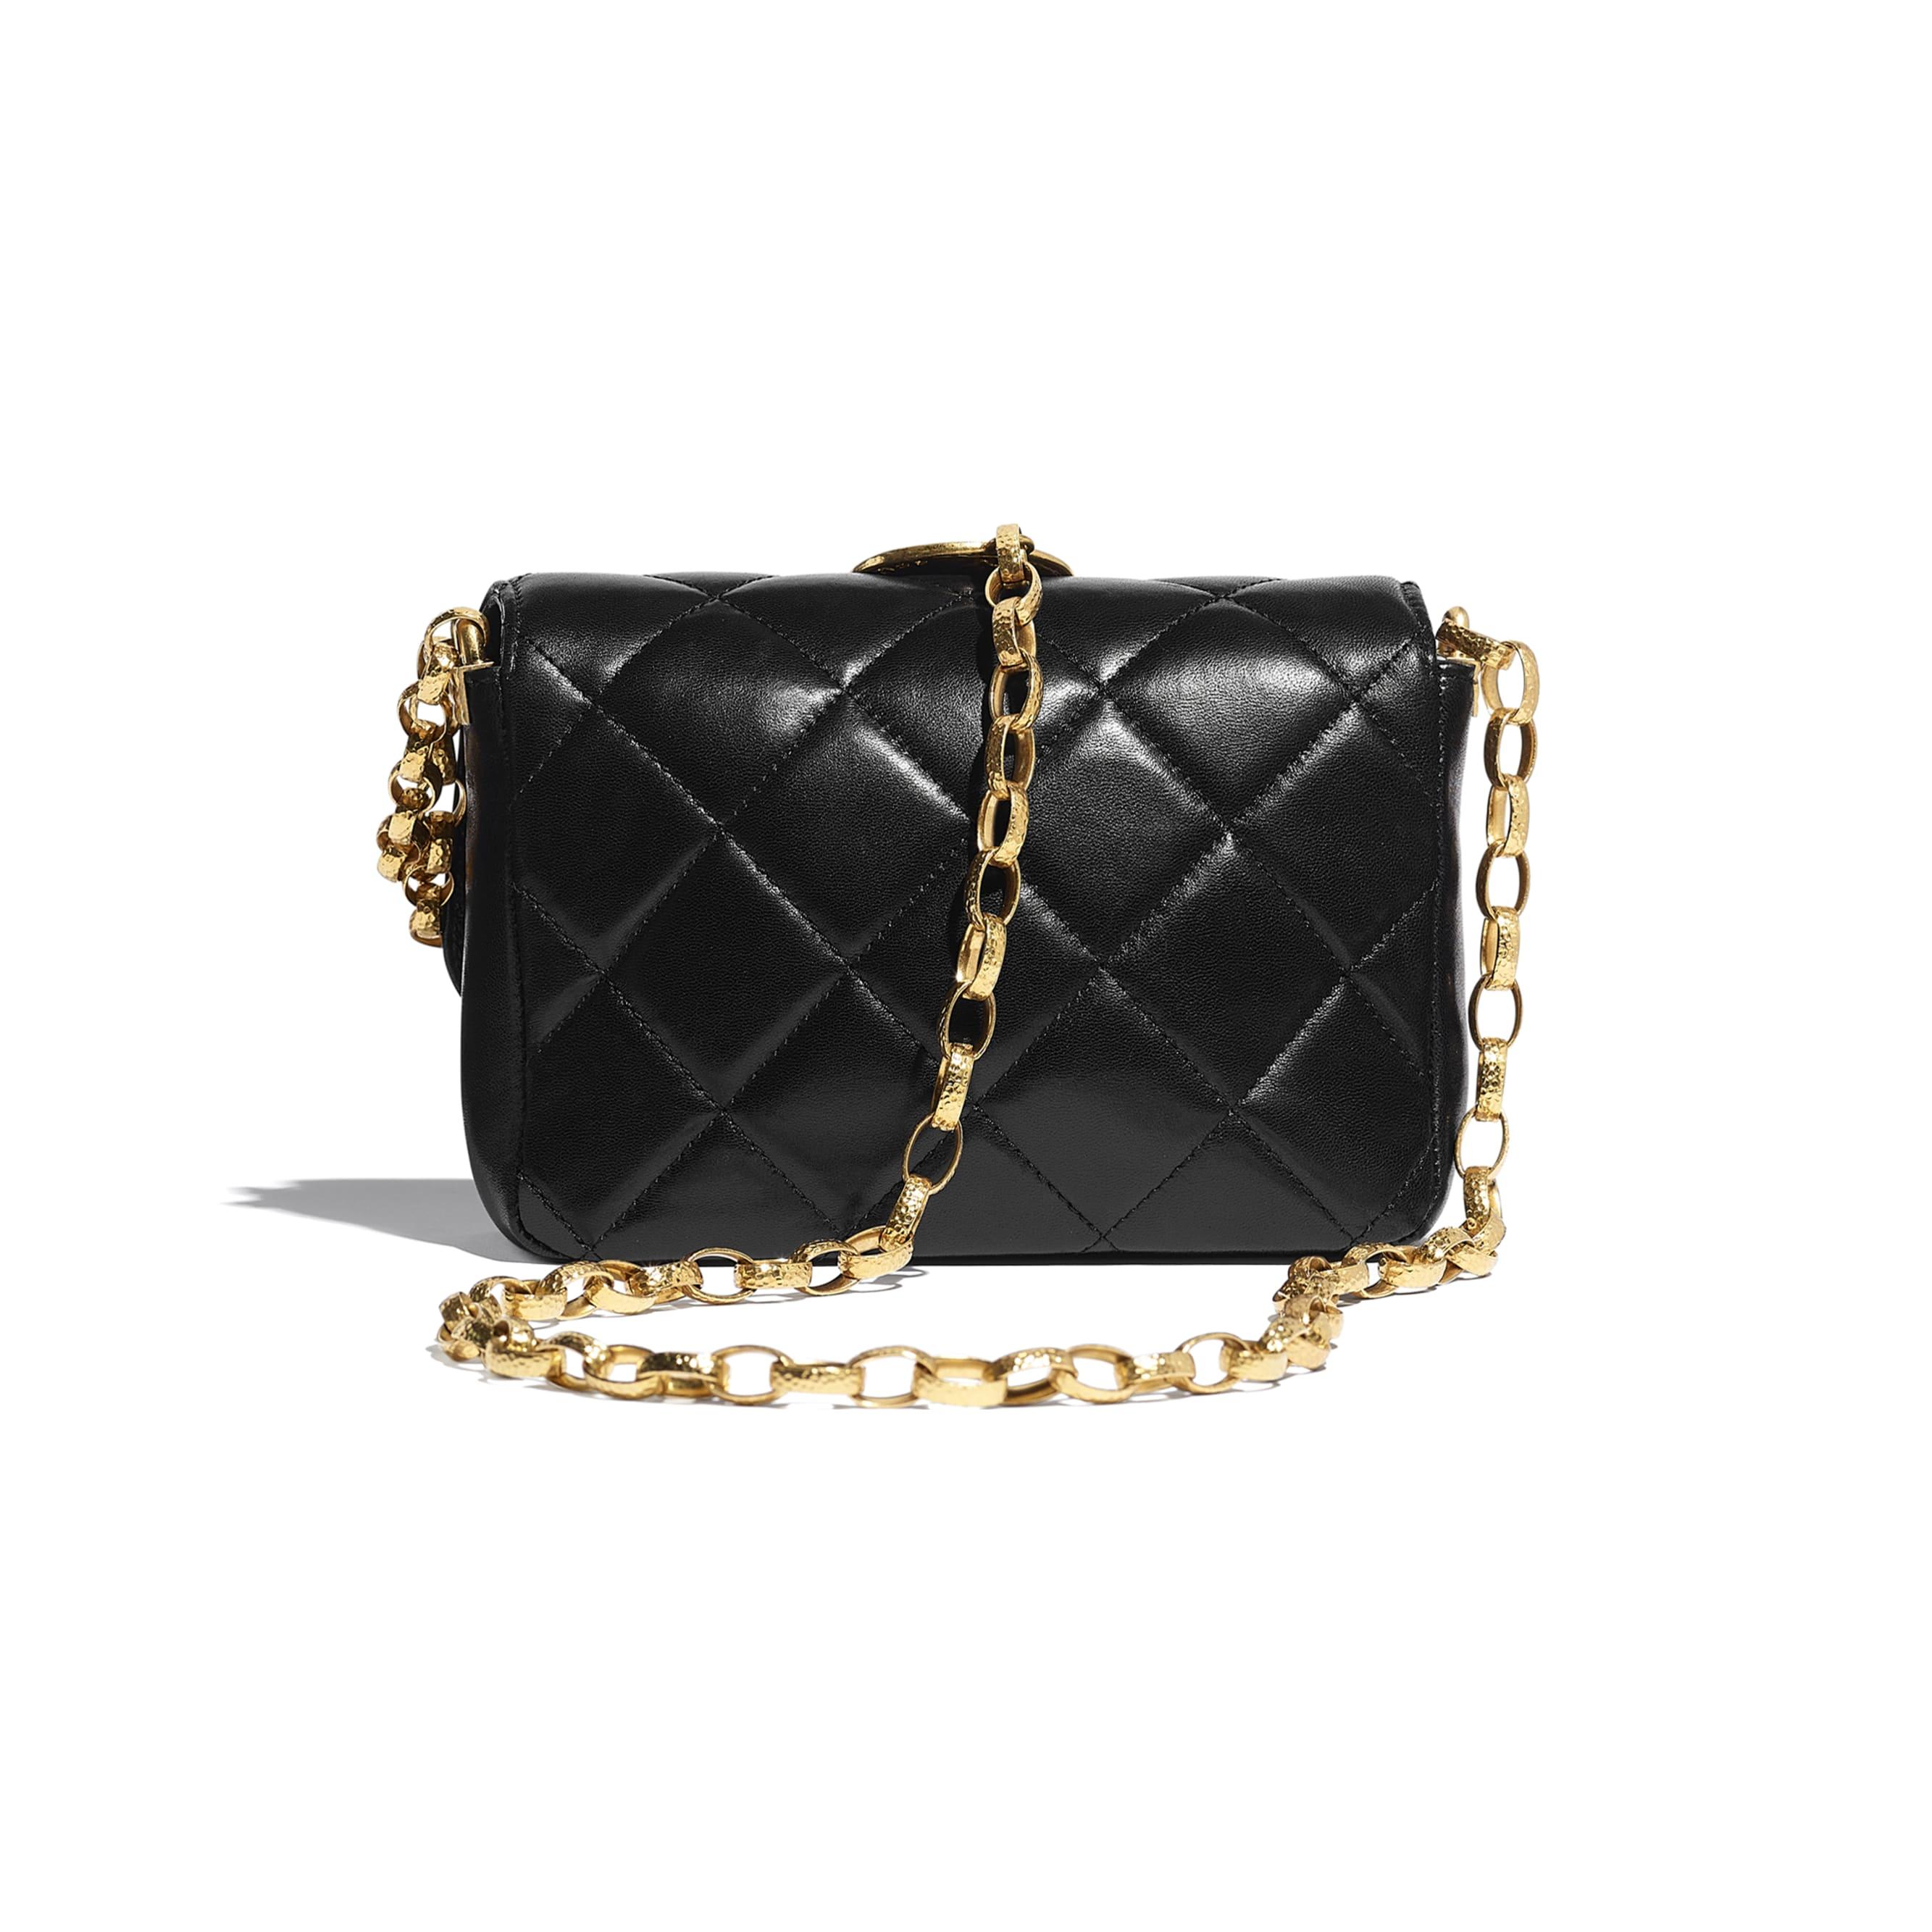 Small Flap Bag - Black - Lambskin & Gold-Tone Metal - CHANEL - Alternative view - see standard sized version